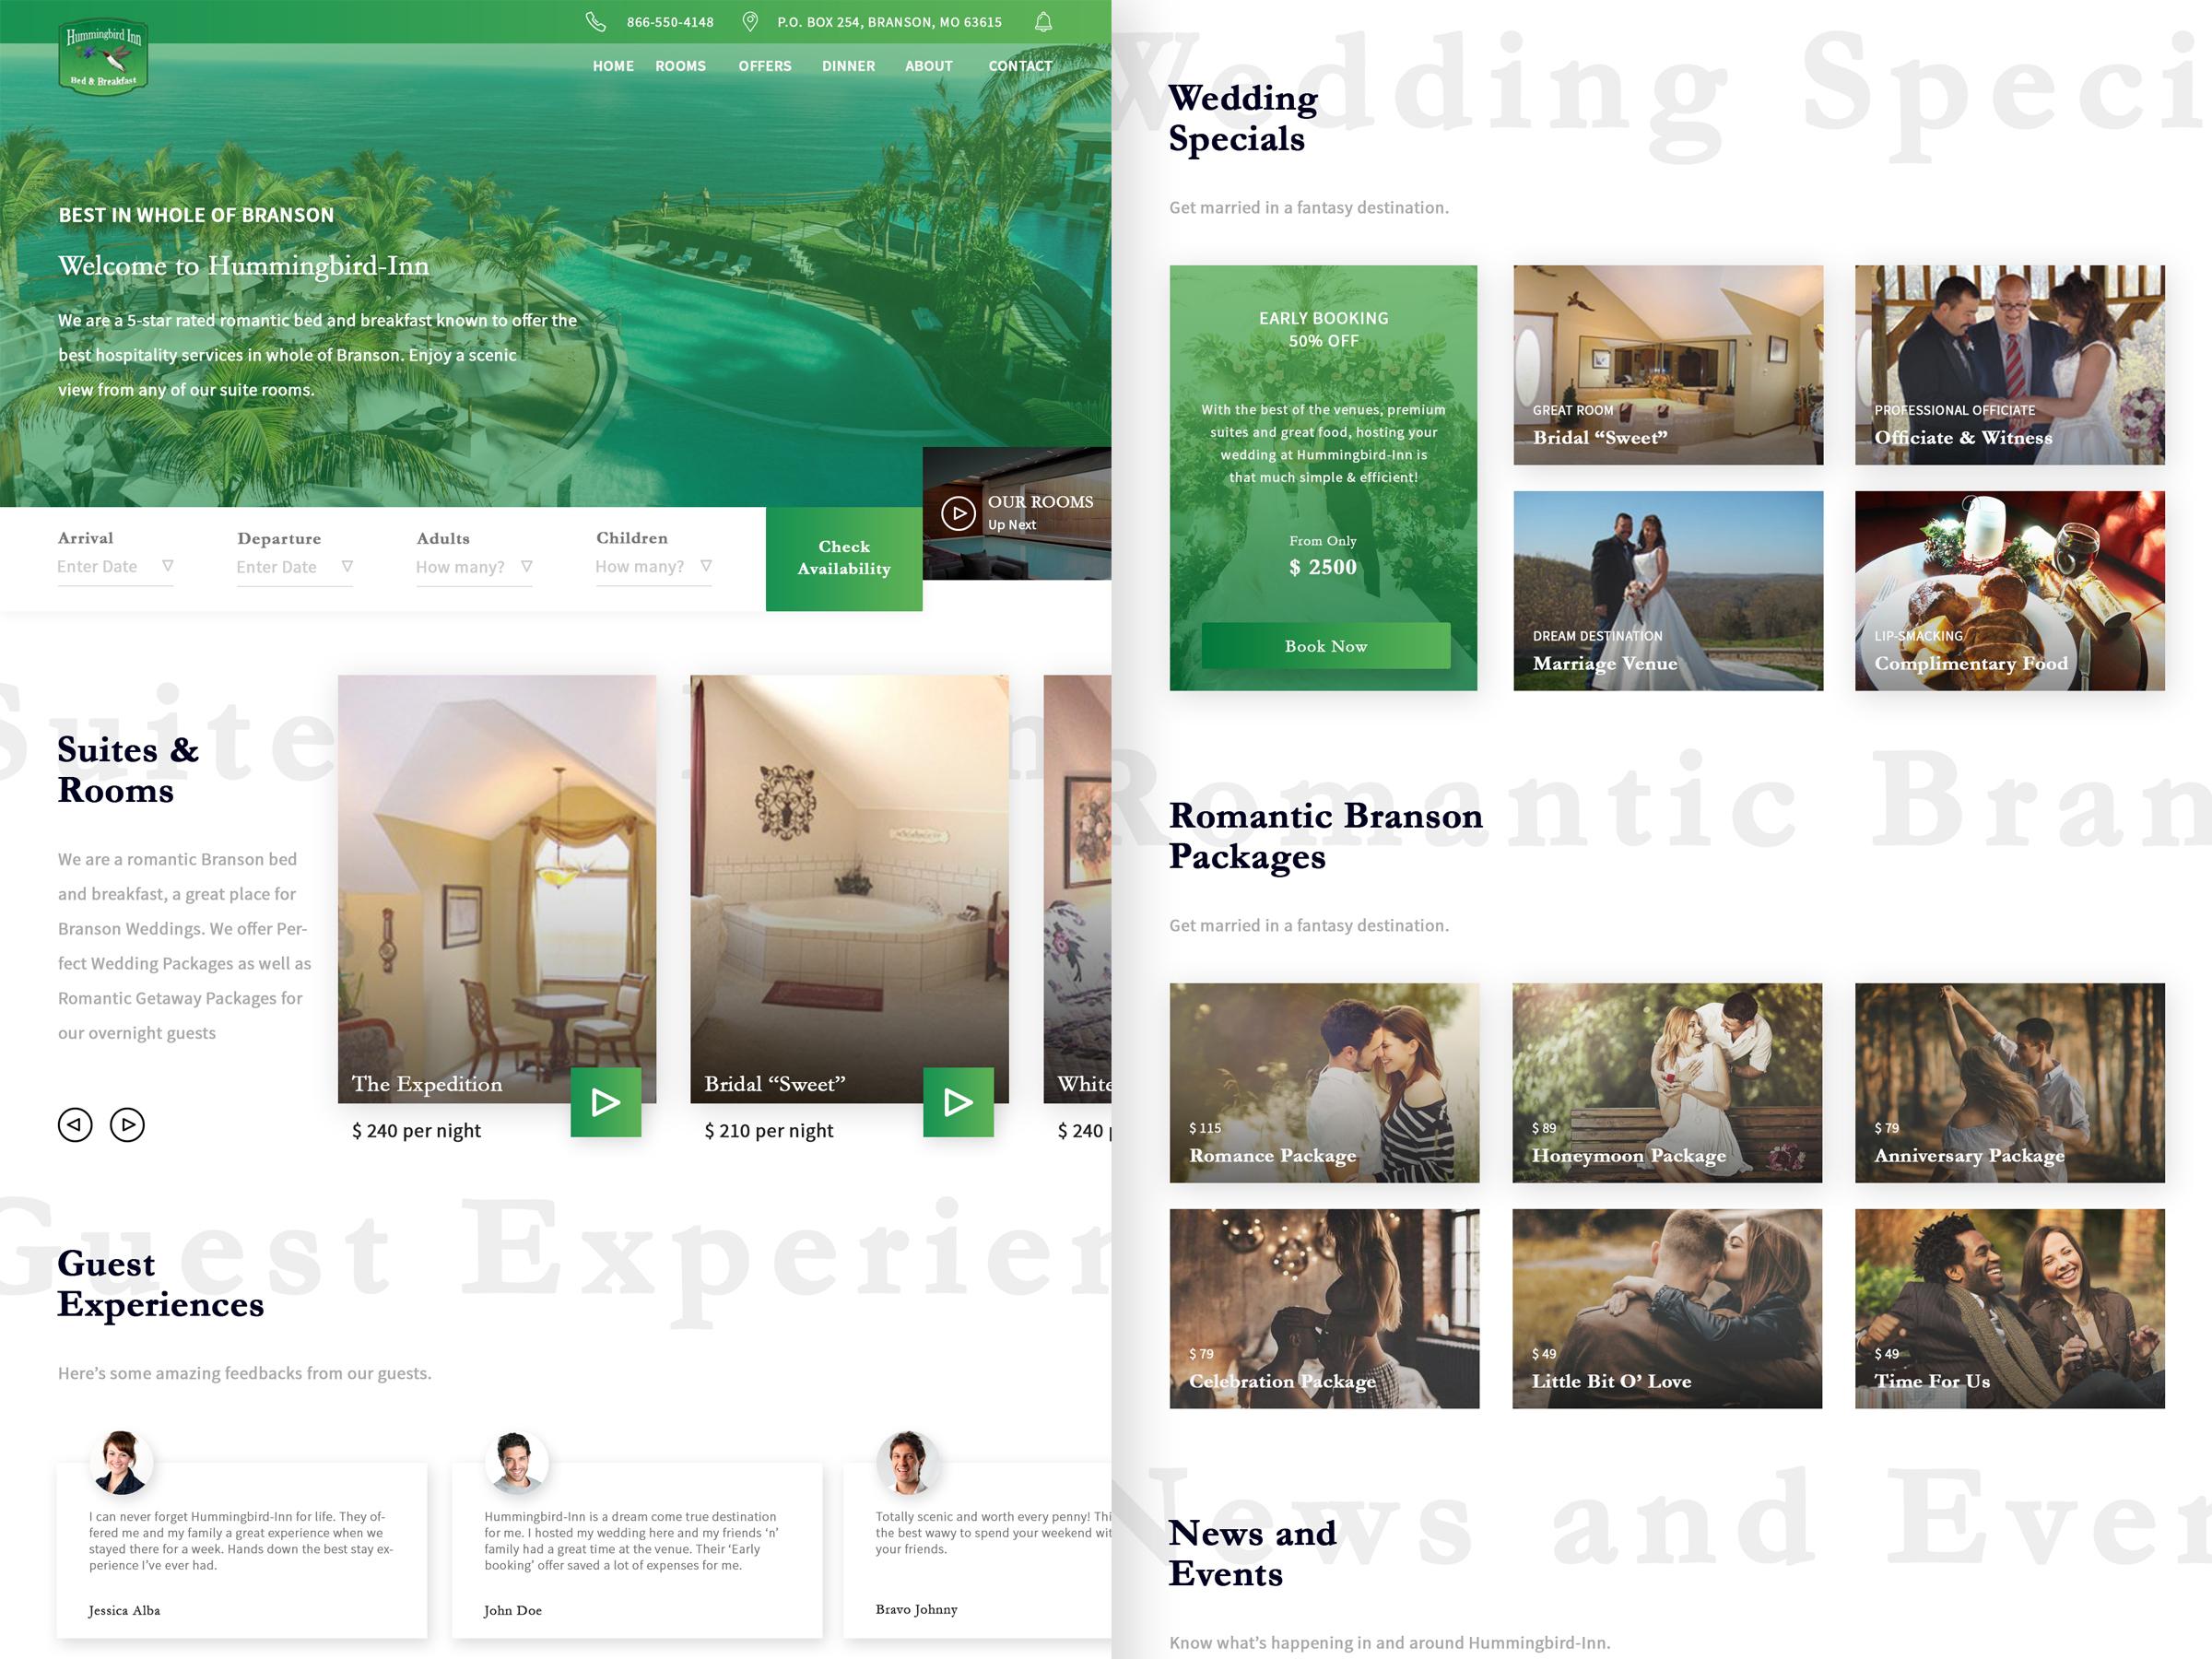 Bed and BreakFast Website Design Example #1